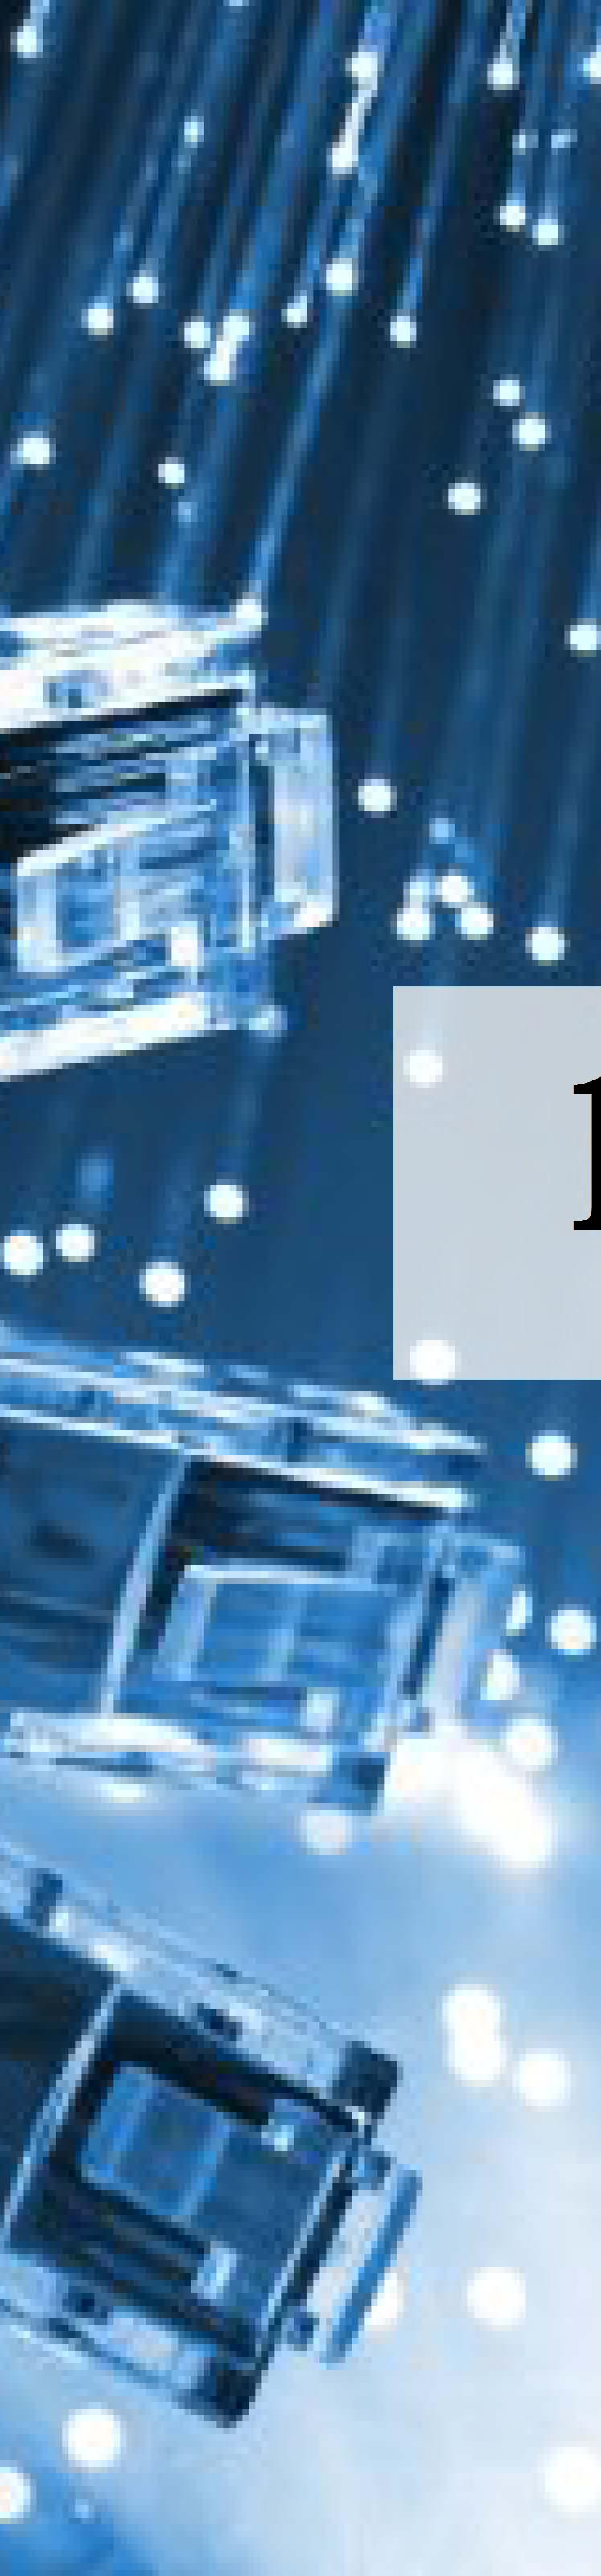 """Link"" تهكير لعبة دريم ليج 2021 || Dream League hack 2021"